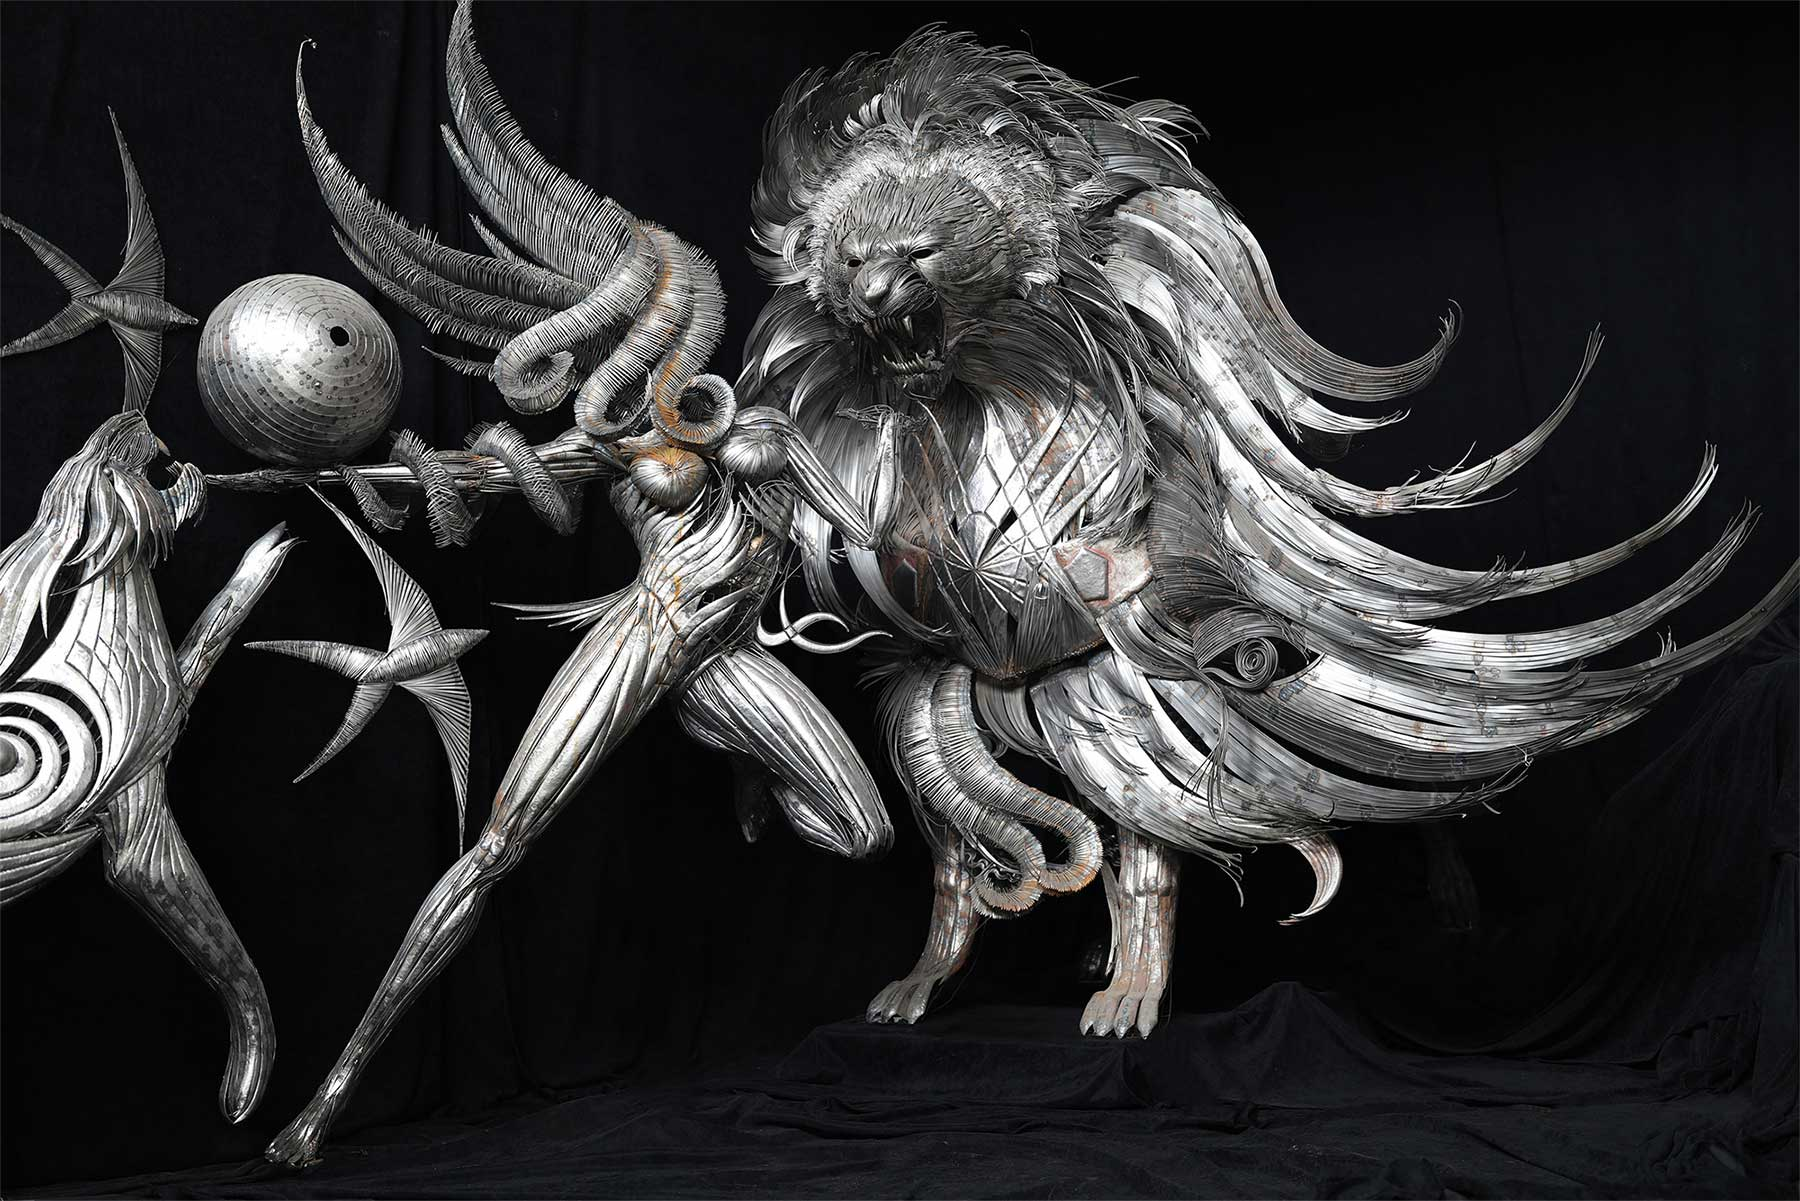 Geniale Altmetall-Skulpturen von Selçuk Yılmaz selcuk-yilmaz-metallskulpturen-2020_02